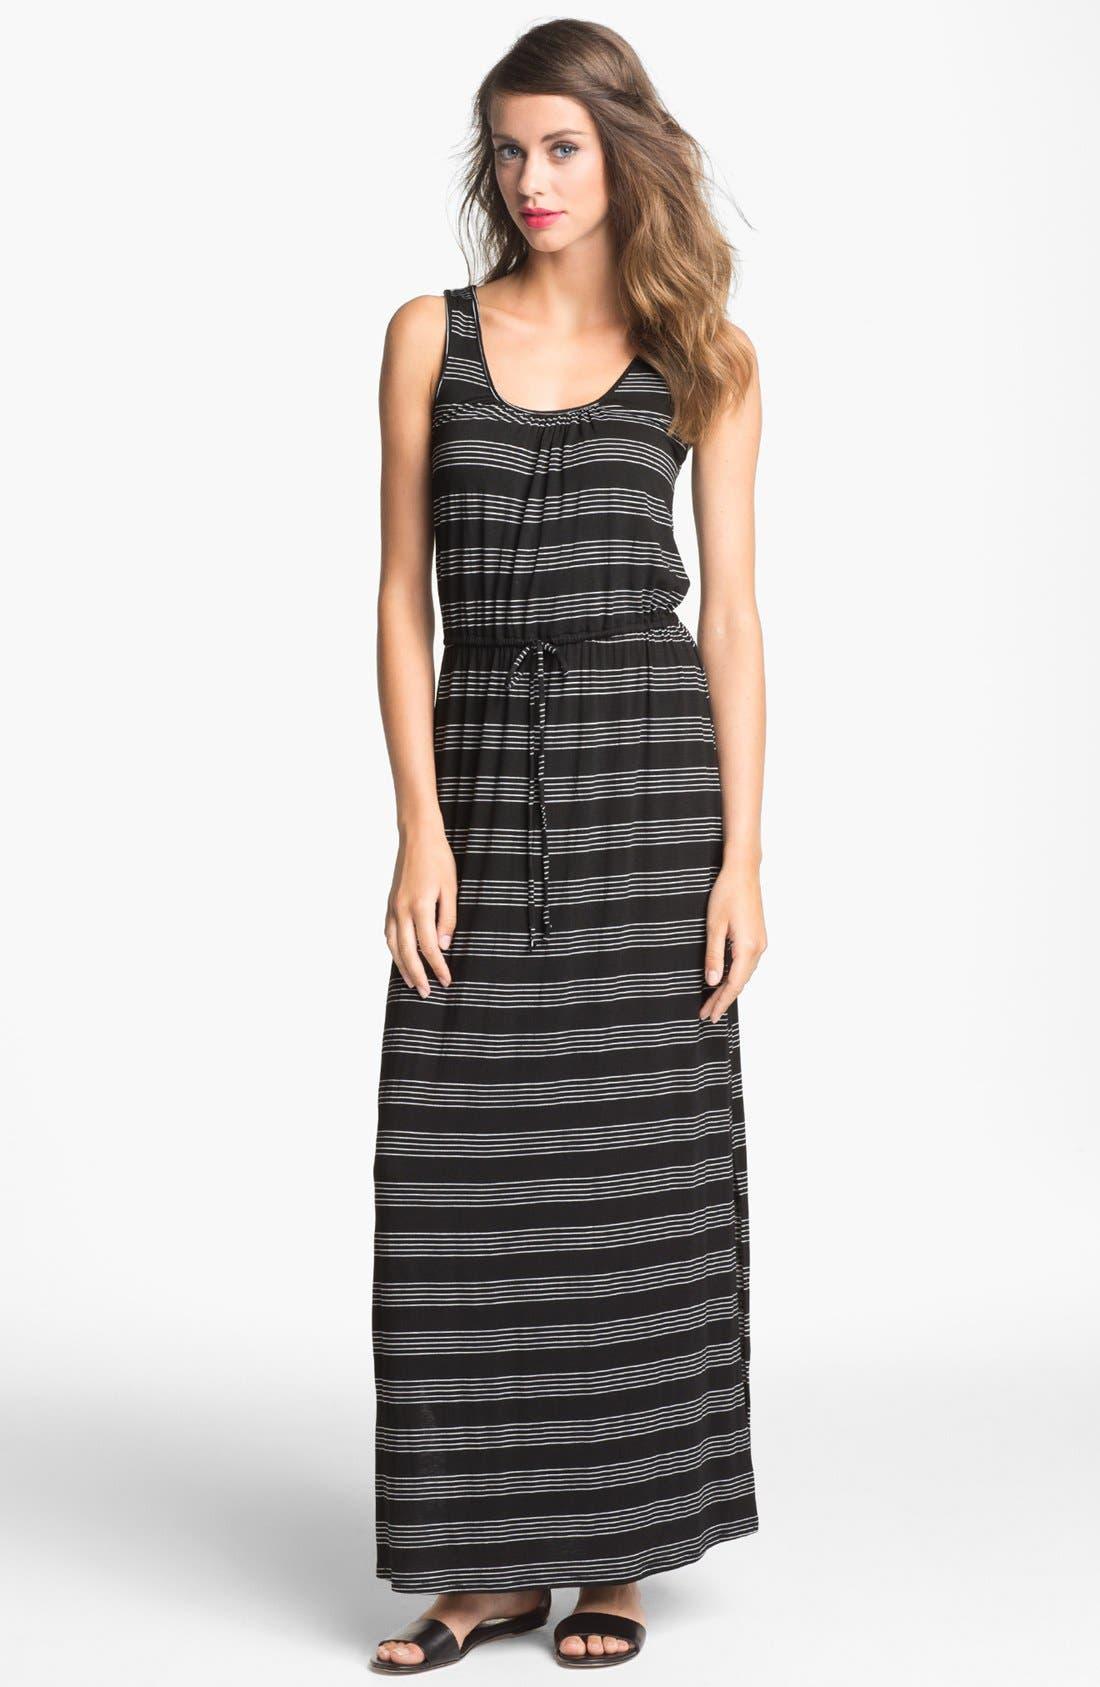 Alternate Image 1 Selected - Loveappella Drawstring Stripe Maxi Dress (Petite)